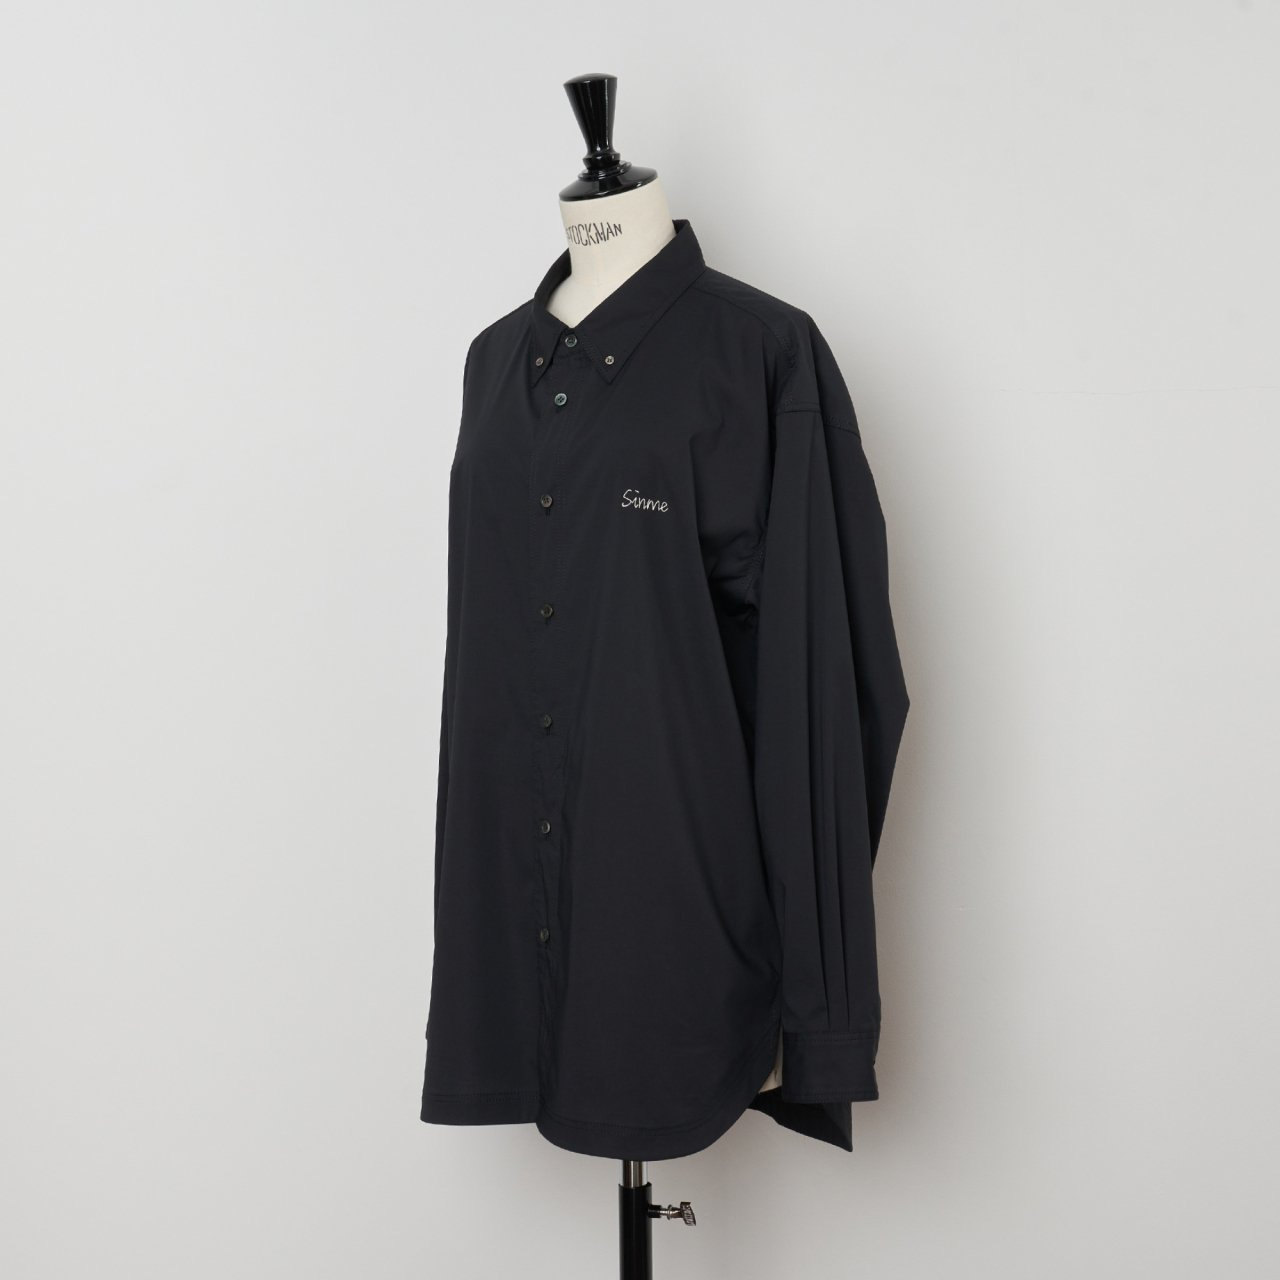 SINME<BR>オーバーサイズシャツ<BR>ブラック×ホワイト